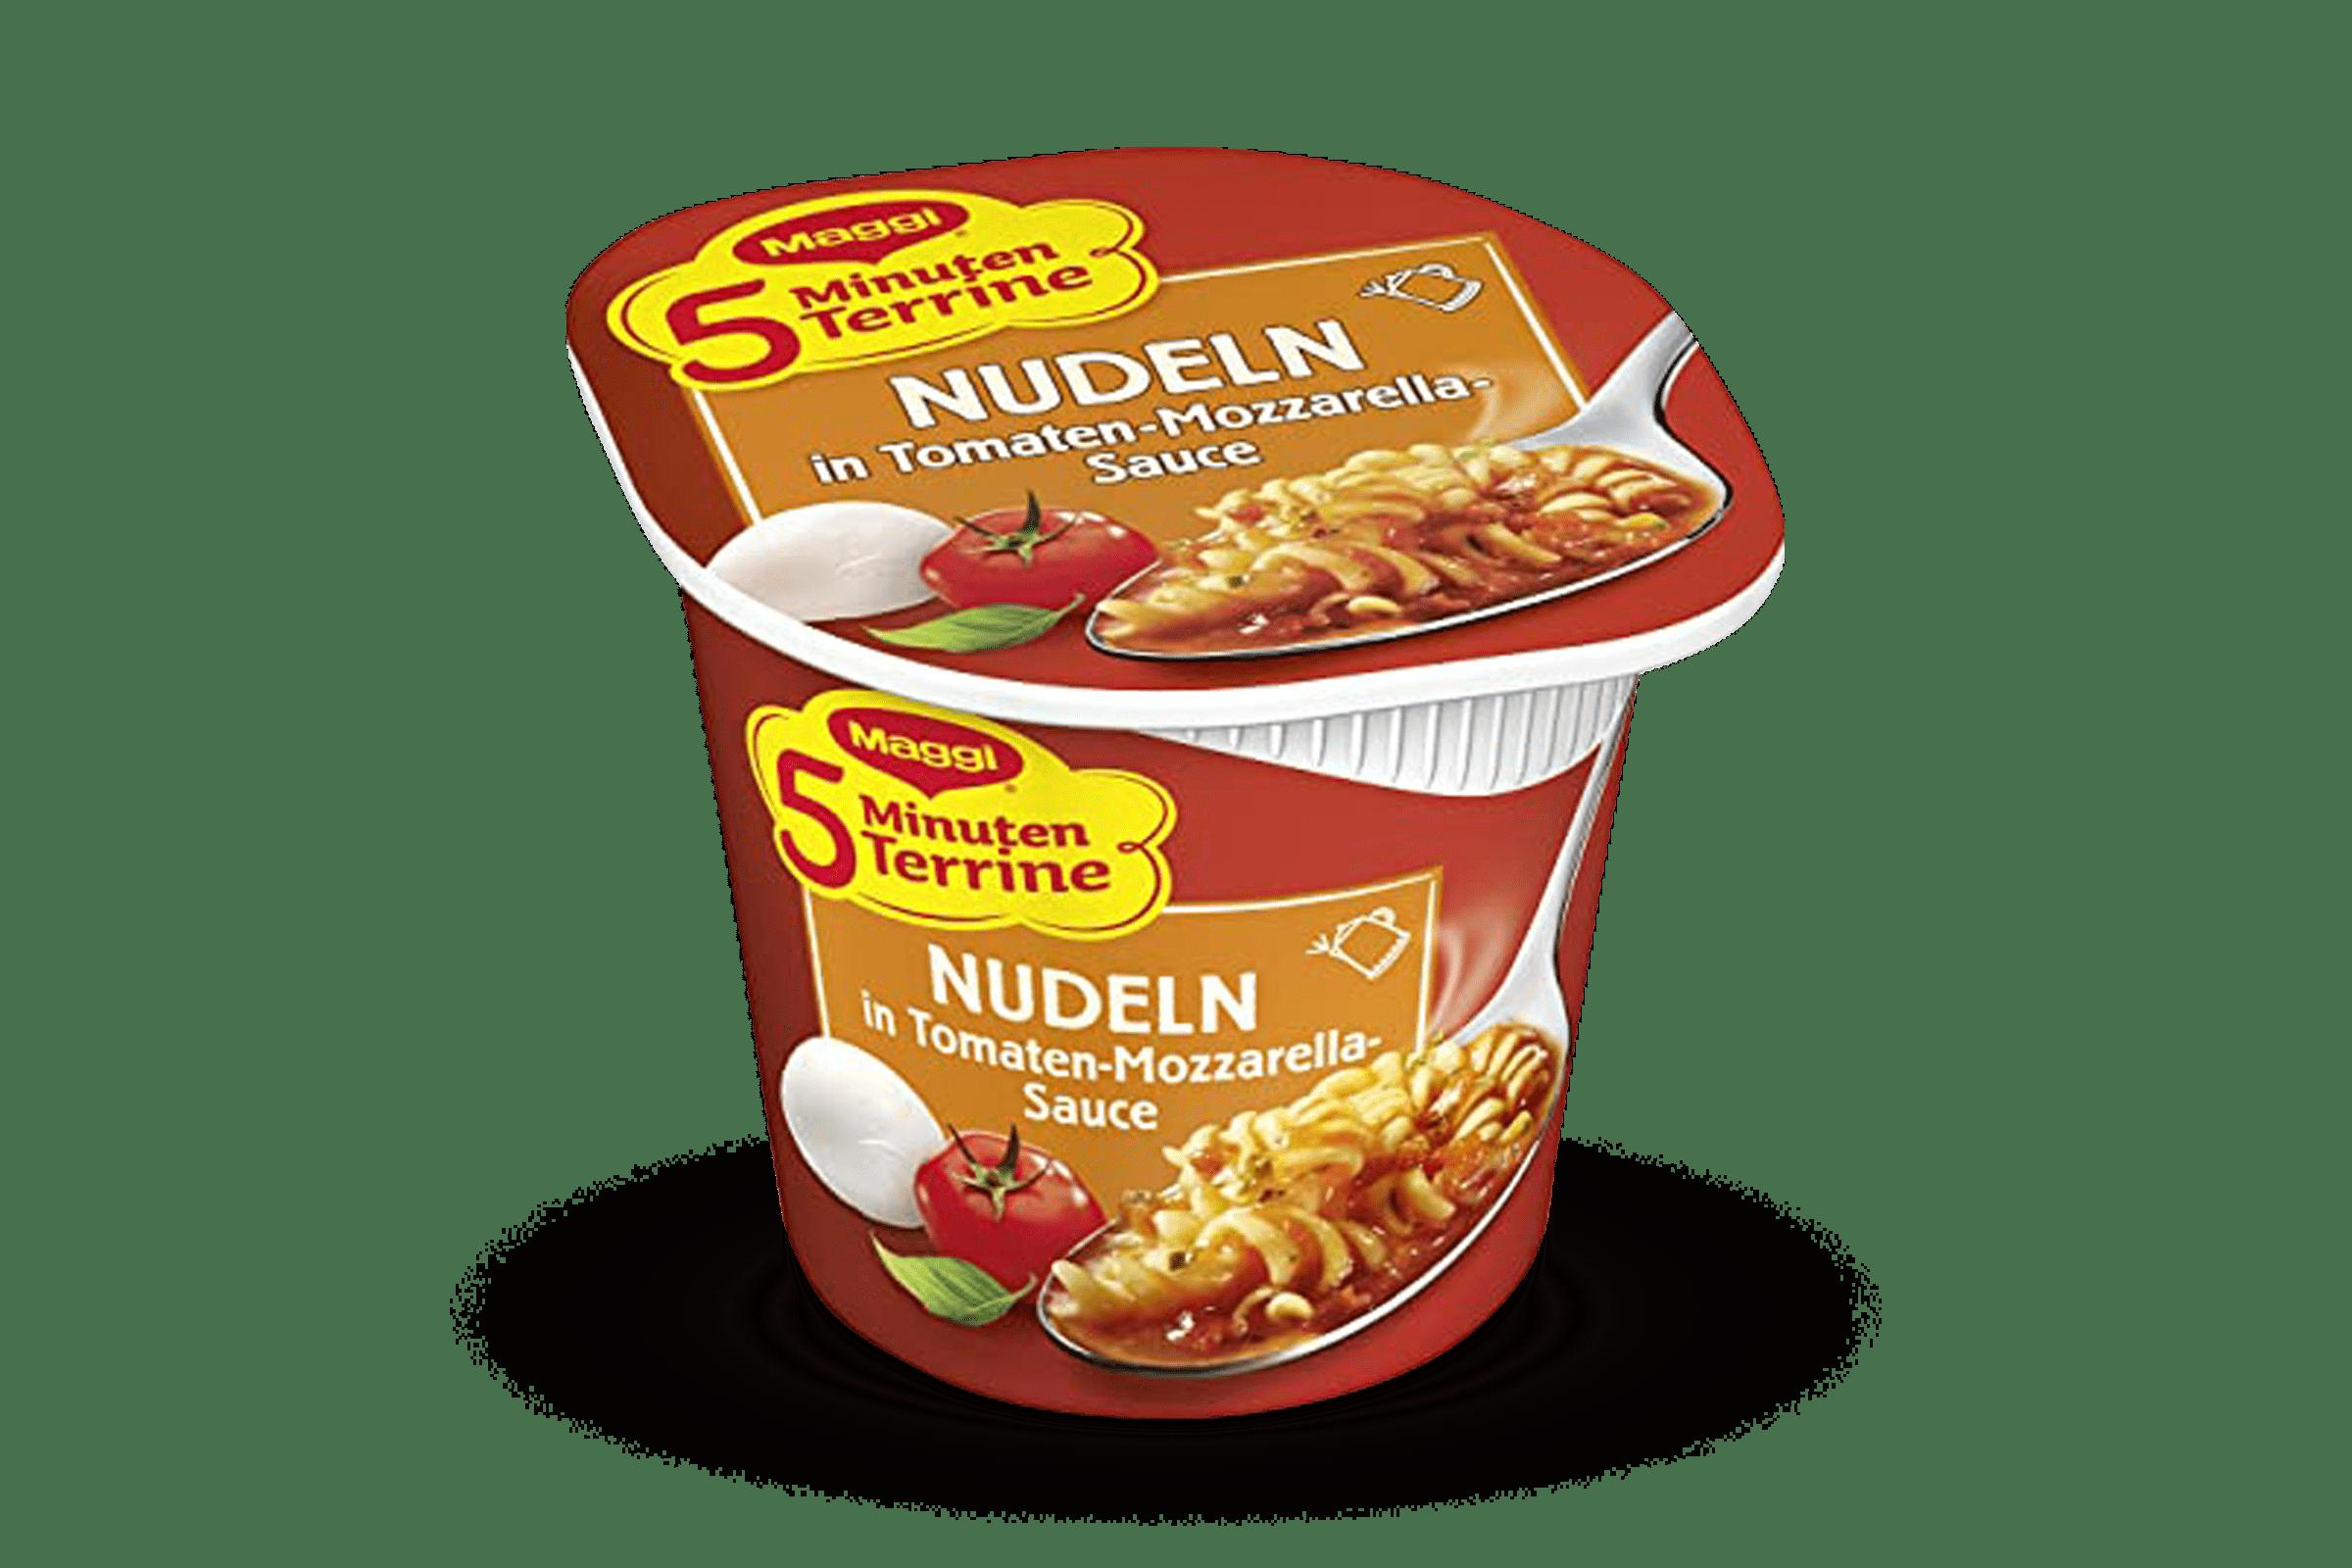 Nudeln Tomaten- Mozzarellasauce Maggi 1